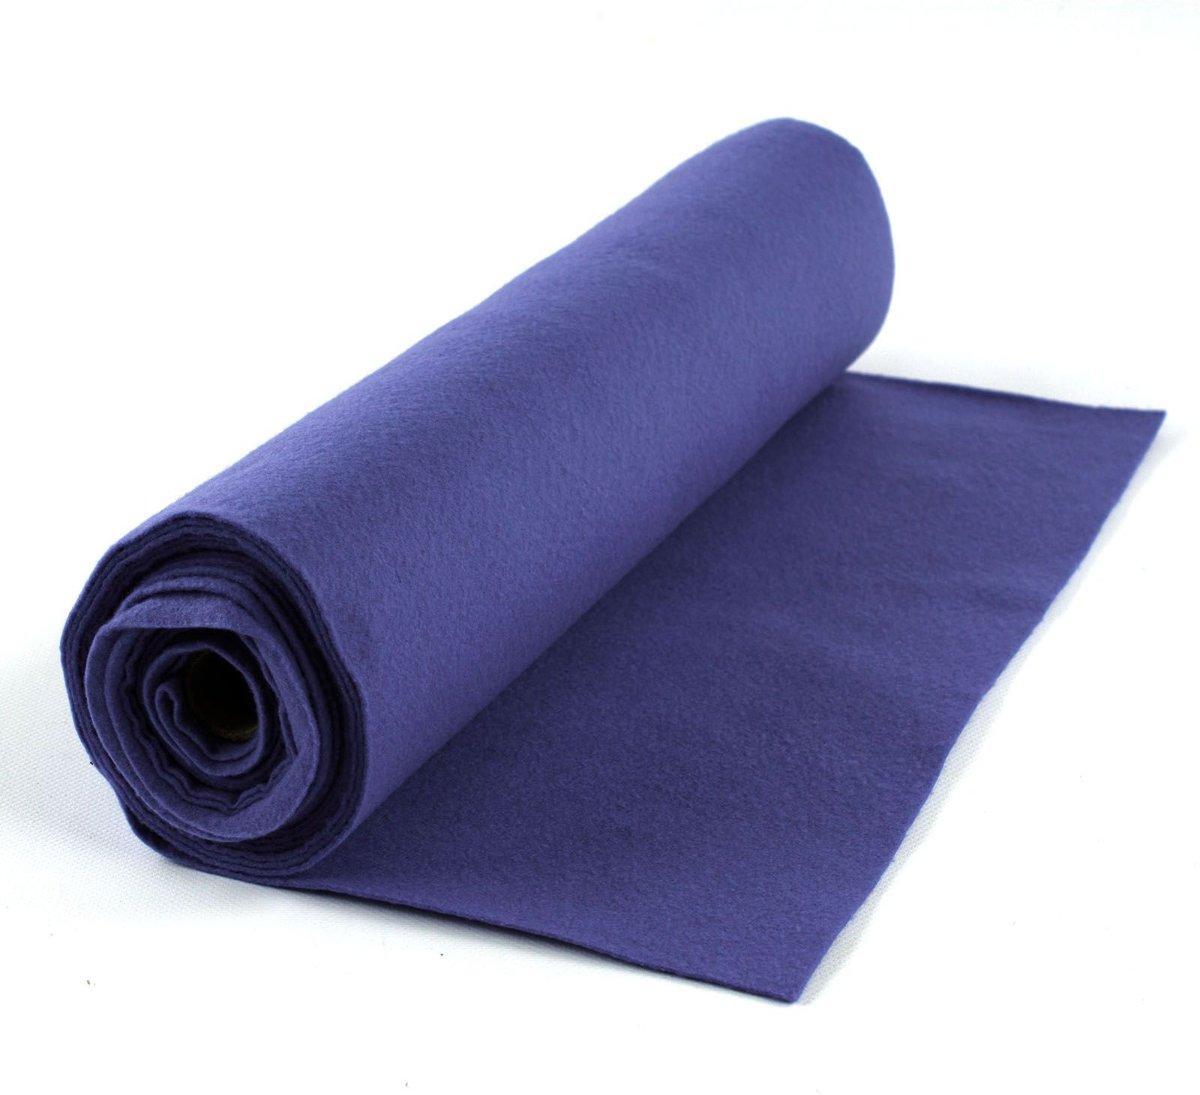 Vilt op Rol 1mm dik 45cmx5m Donker Lavendel kopen